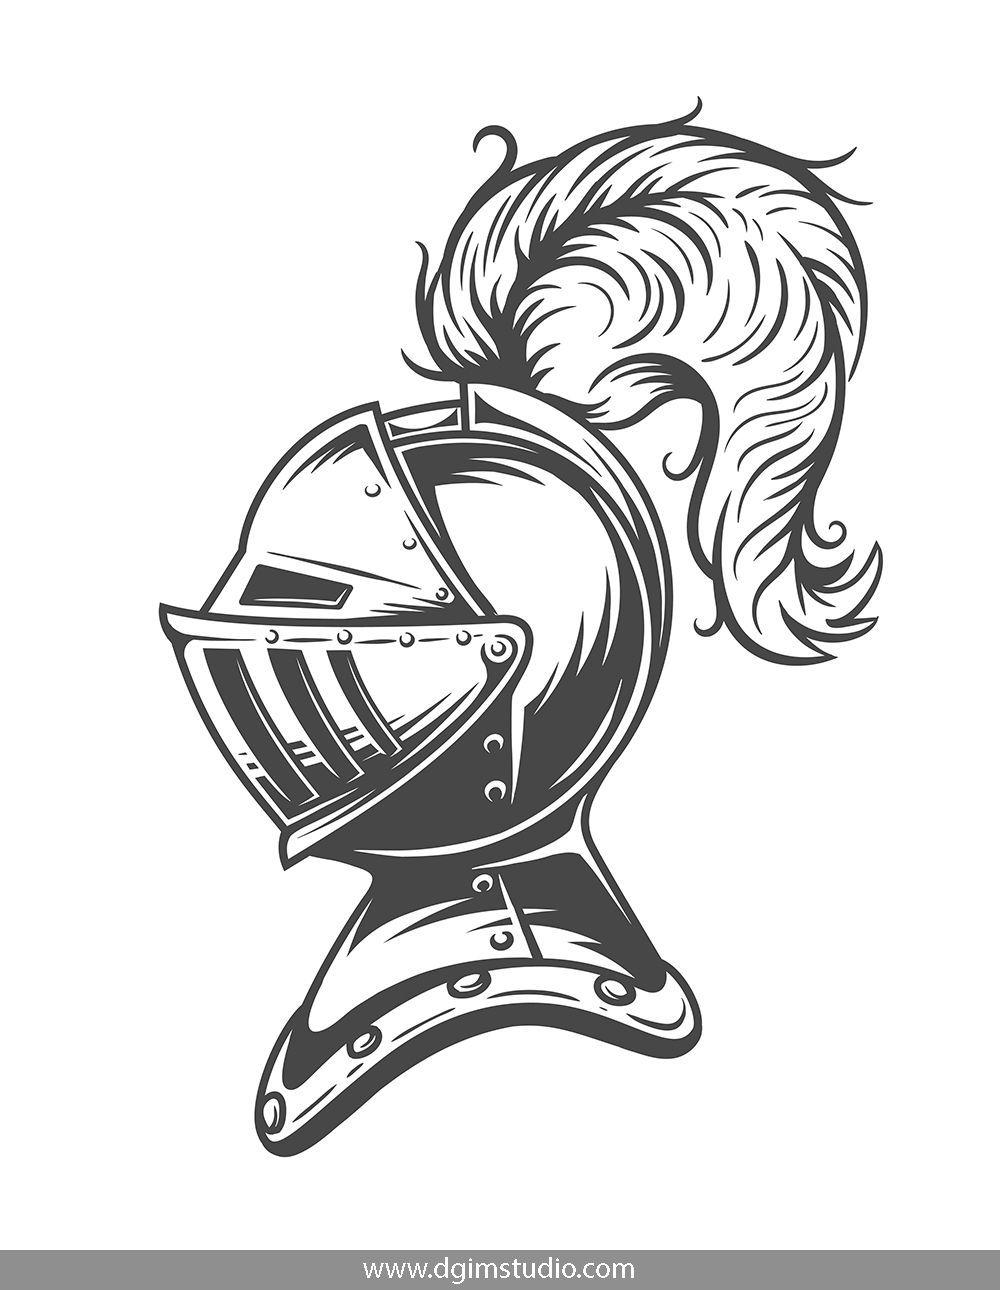 Knights Templates And Elements Knight Tattoo Armor Drawing Knights Helmet